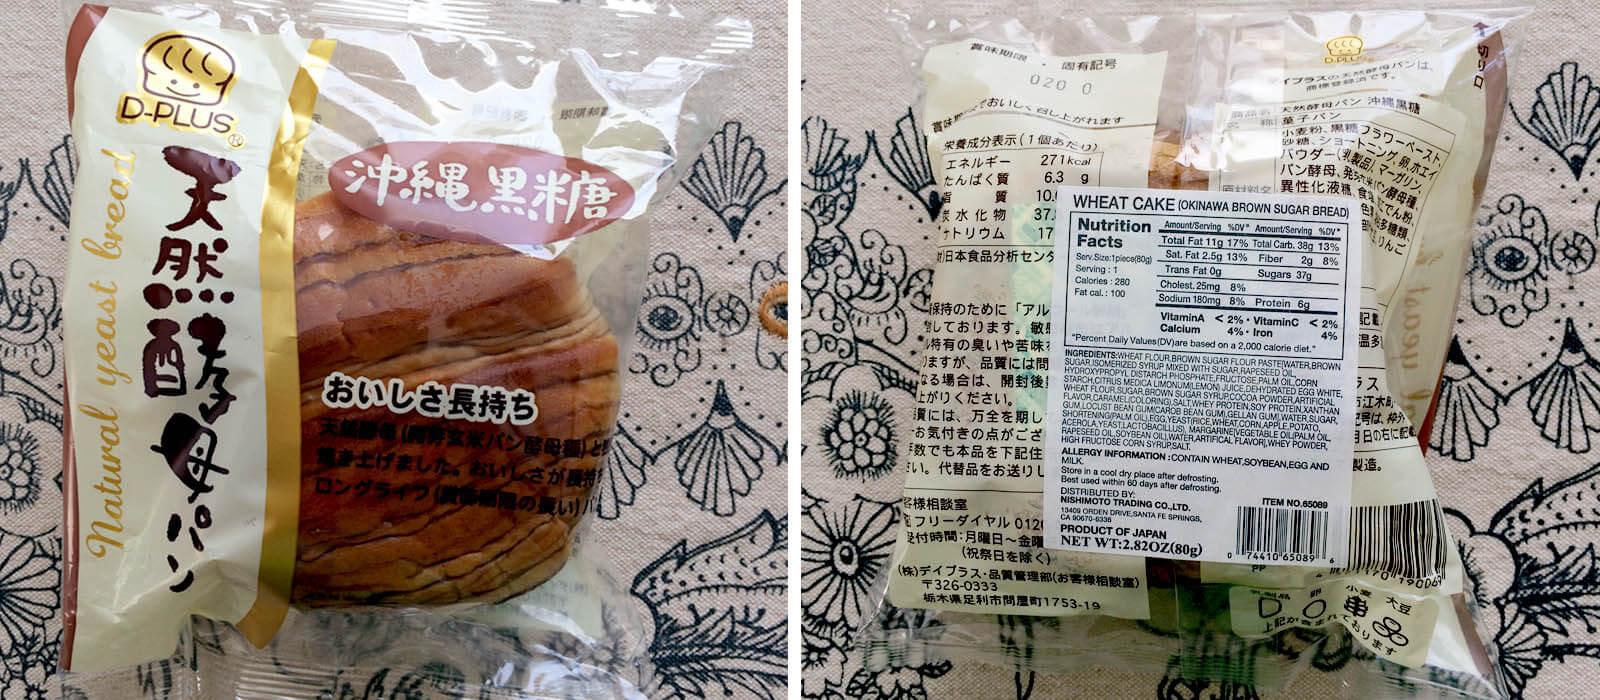 D-Plus Okinawa Brown Sugar Bread